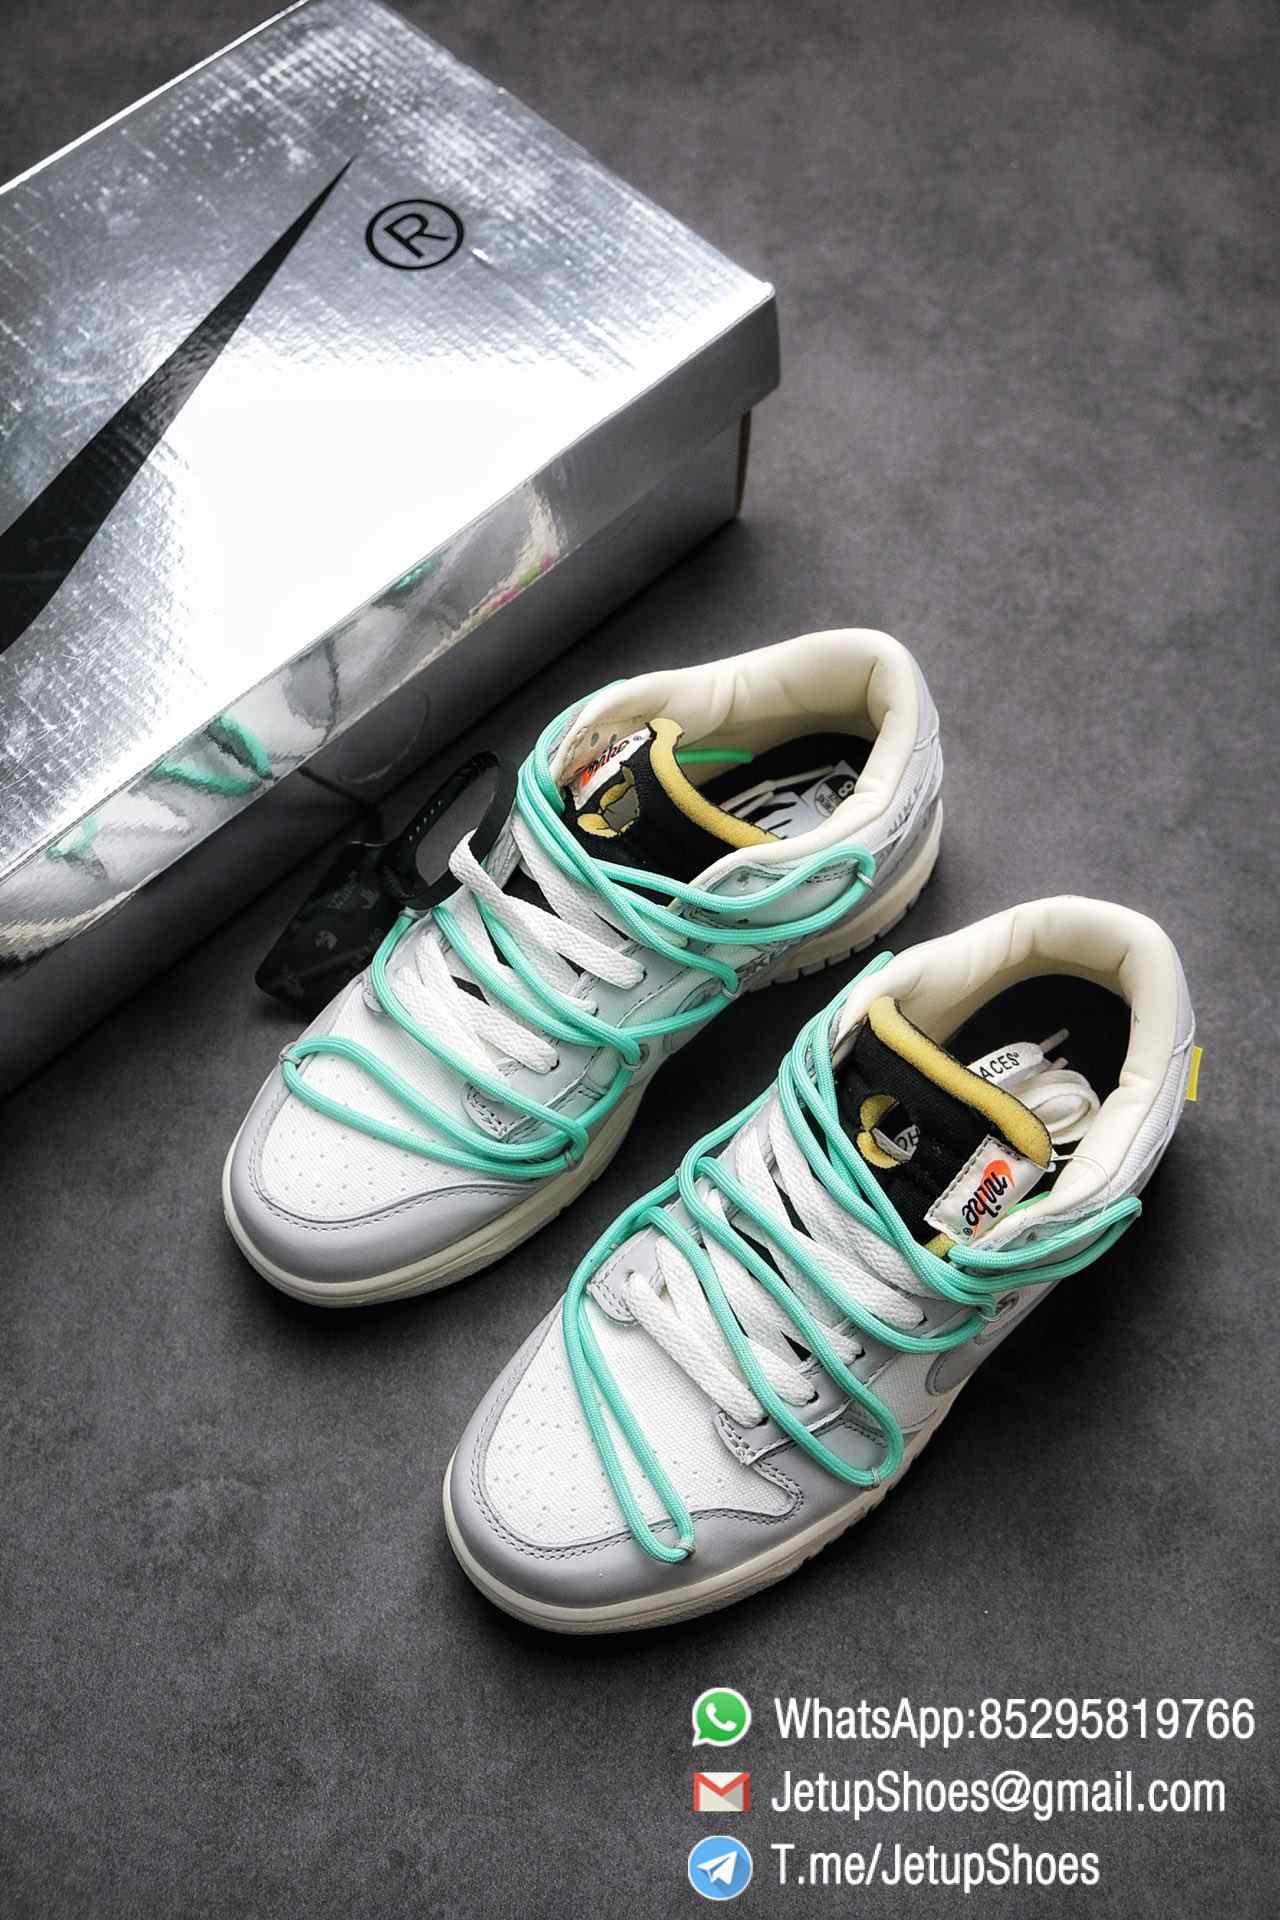 Best Replica Nike Sneakers 0ff White x Nike Dunk Low 04 of 50 SKU DM1602 114 Top RepSneakers Supplier 04